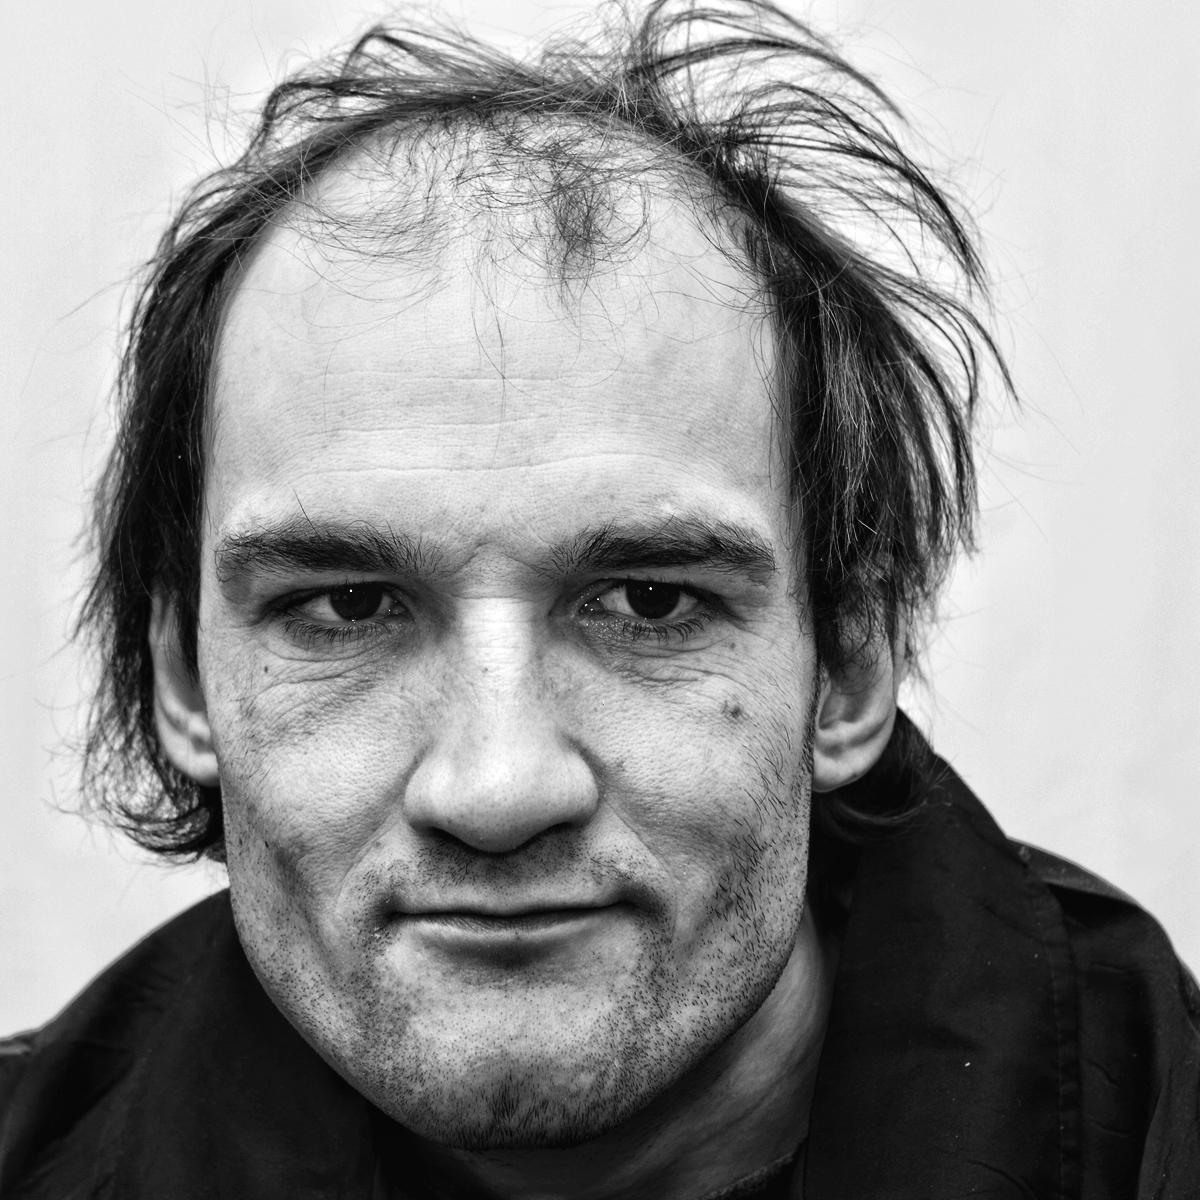 Олег Климов, М-Журнал Liberty.SU